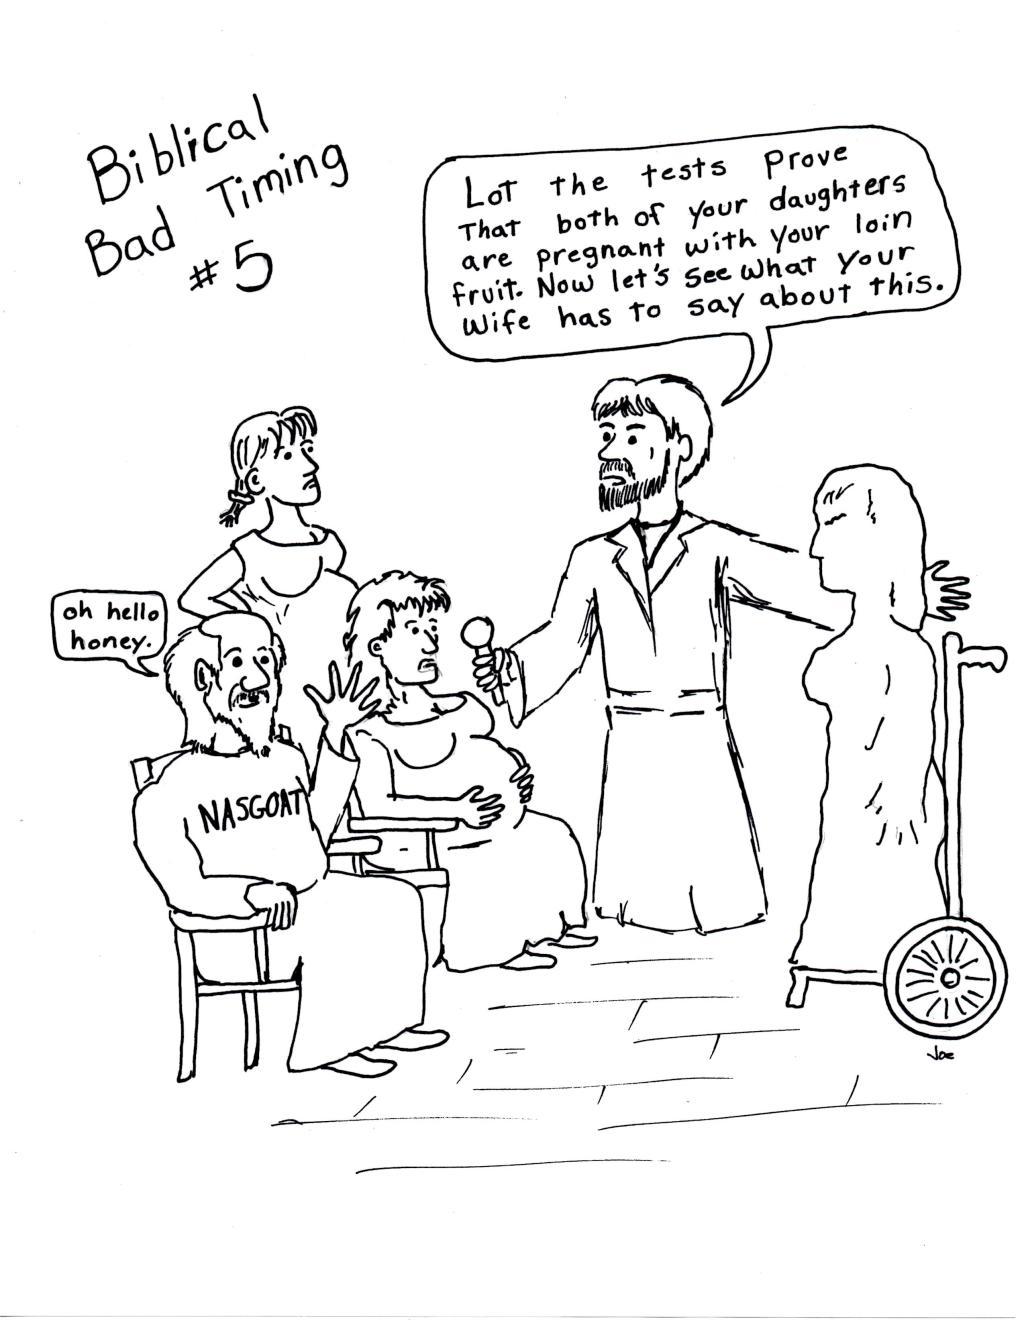 Biblical Bad Timing #5